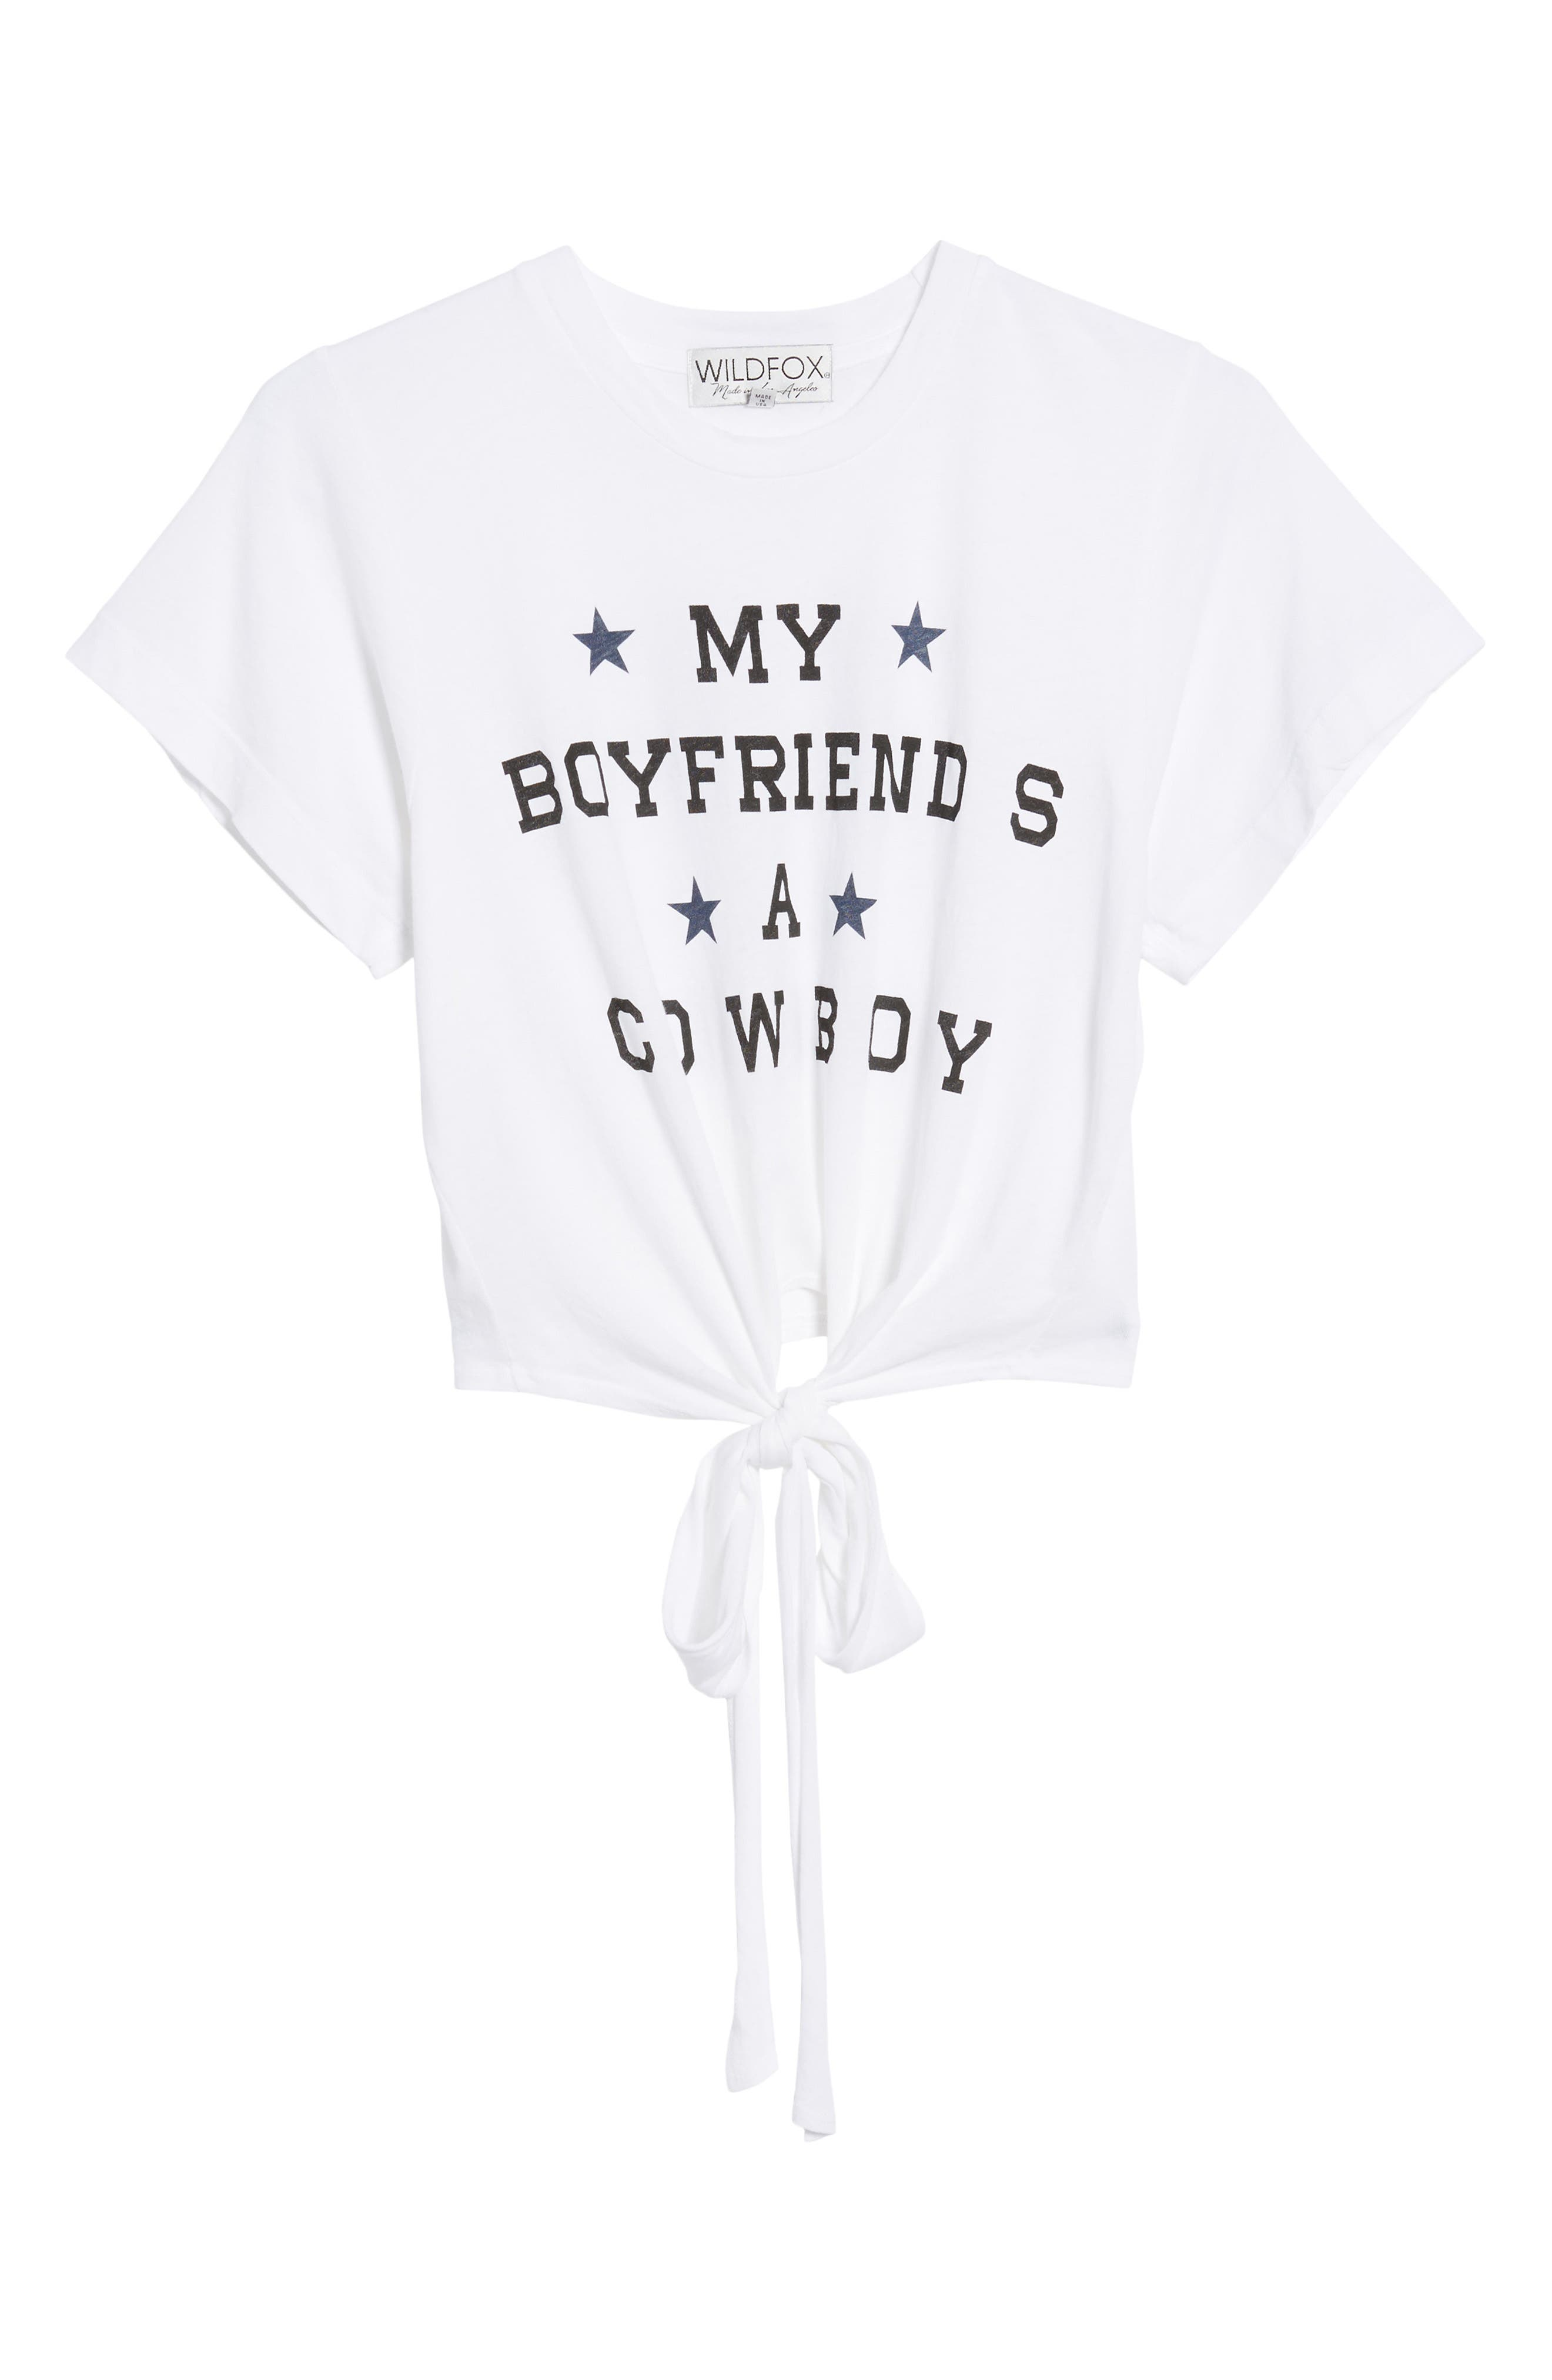 My Boyfriend Is a Cowboy Tee,                             Alternate thumbnail 6, color,                             100